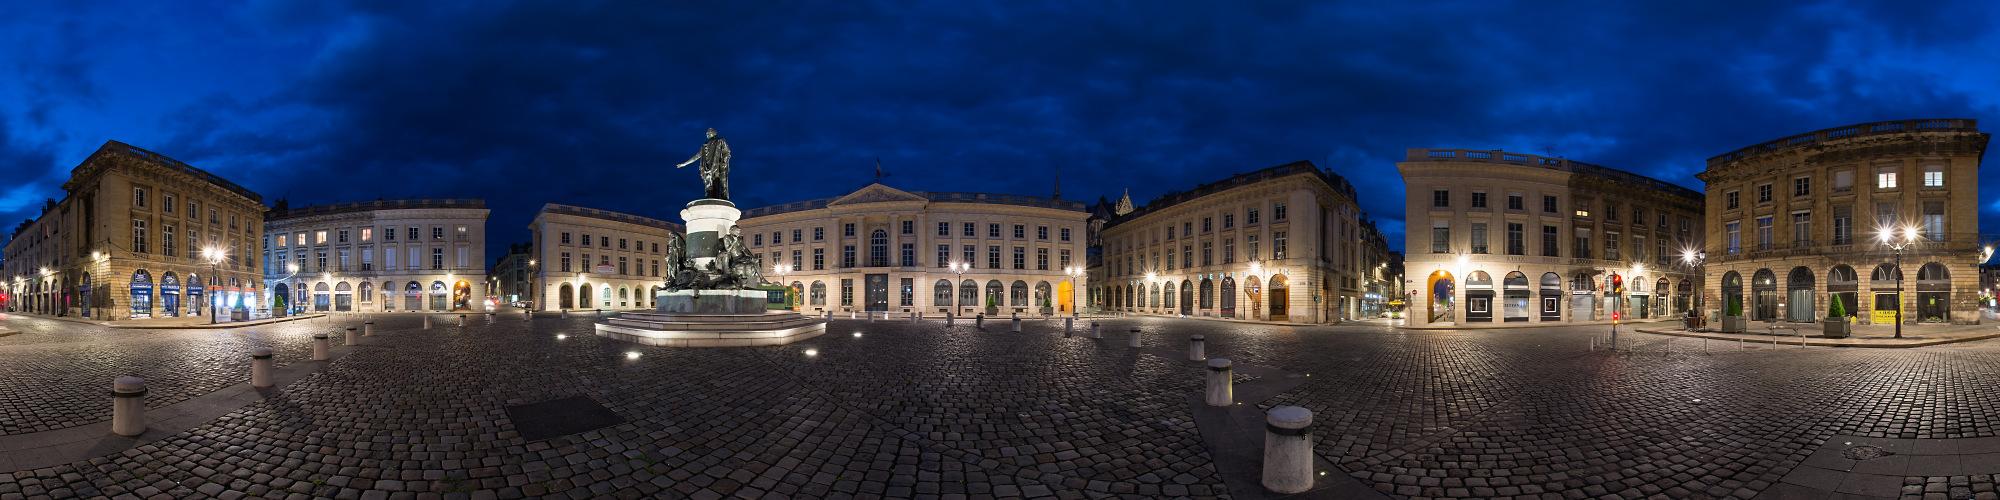 Reims Place Royal Panorama